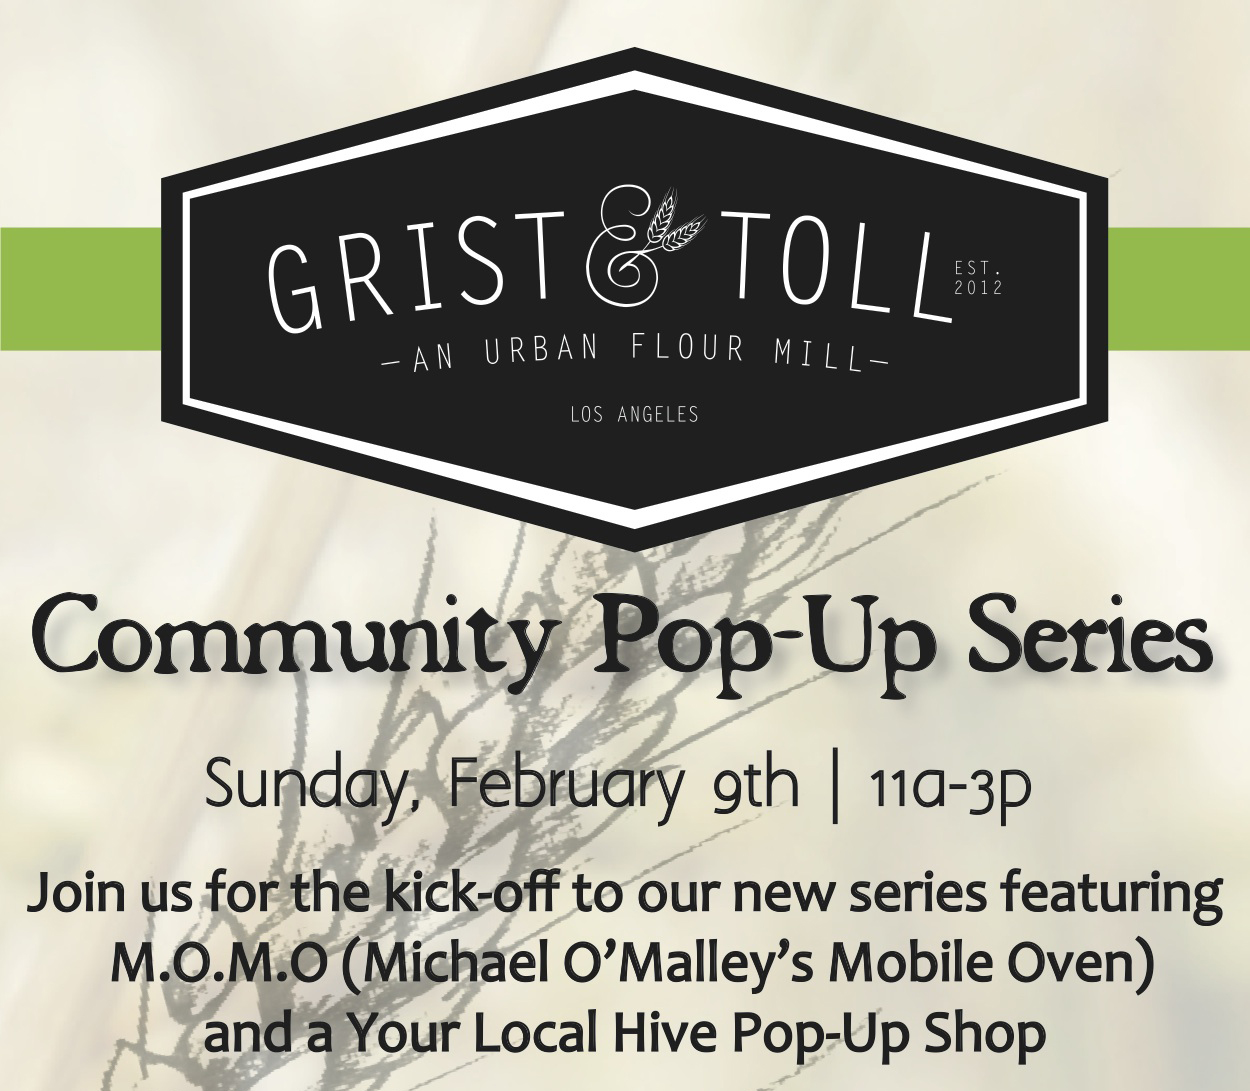 Grist & Toll 2.9.2014 Popup.jpg